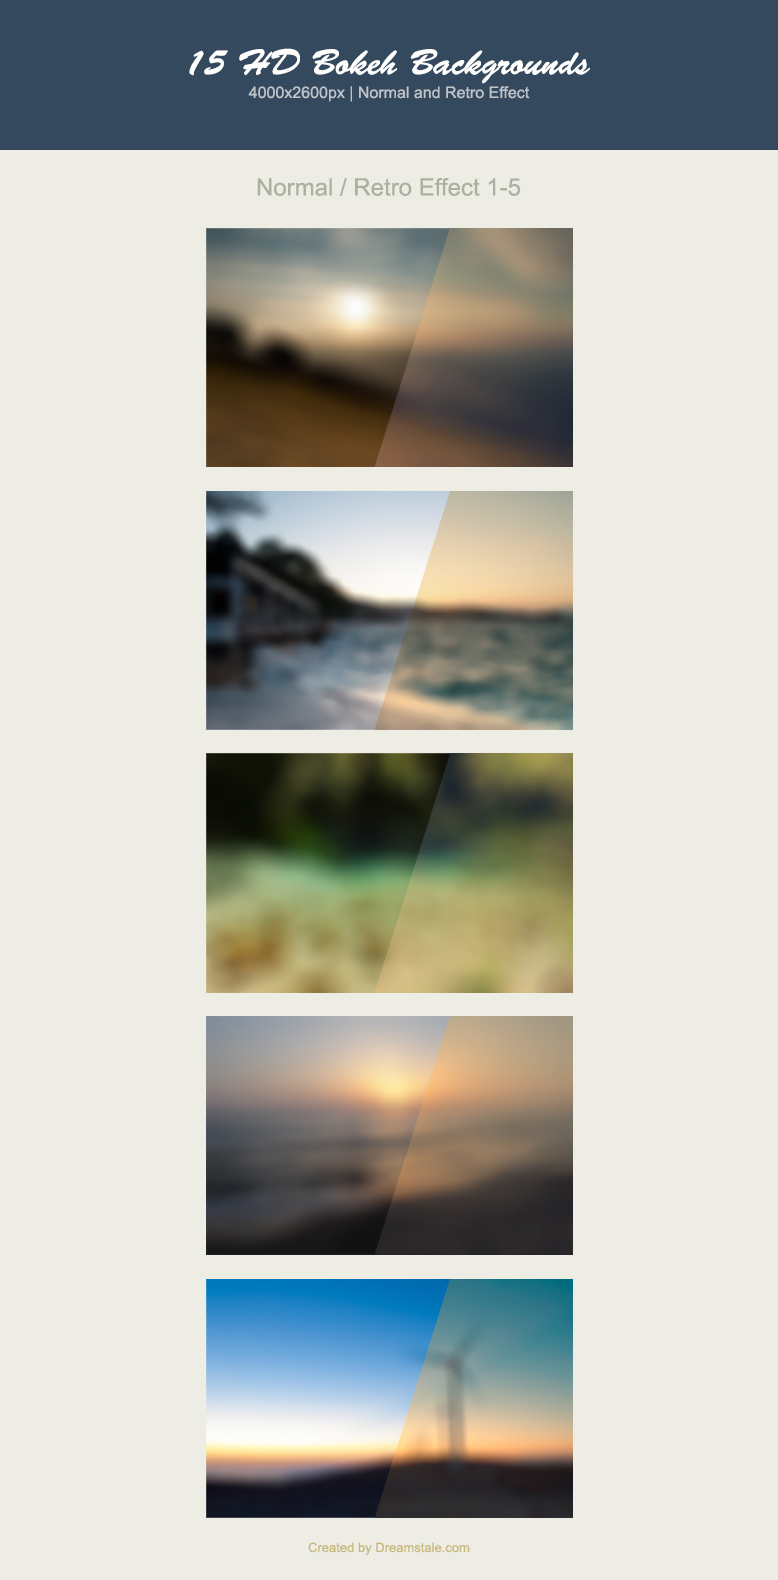 download 15 hd premium bokeh backgrounds - preview 1